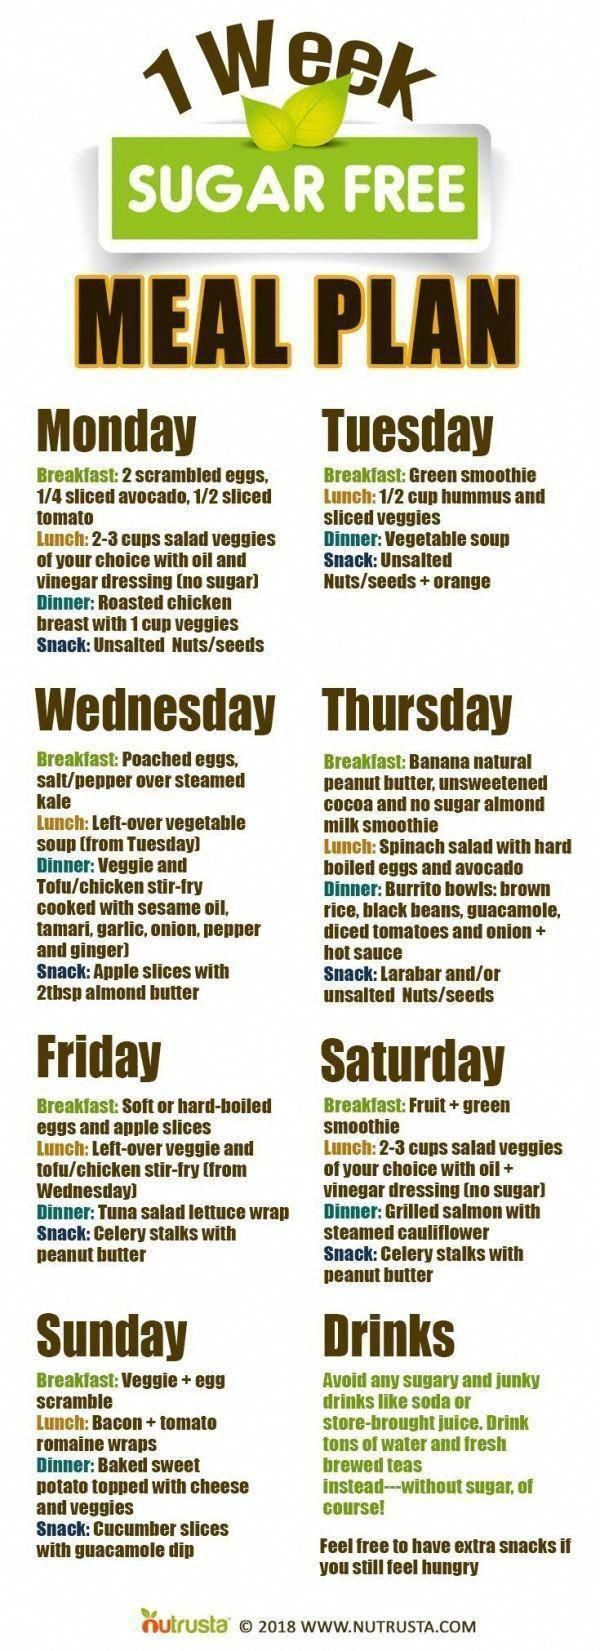 Ketogenic Diet Plan Calories #FullKetogenicDietPlan #SampleKetogenicDietPlan #KetogenicDietList